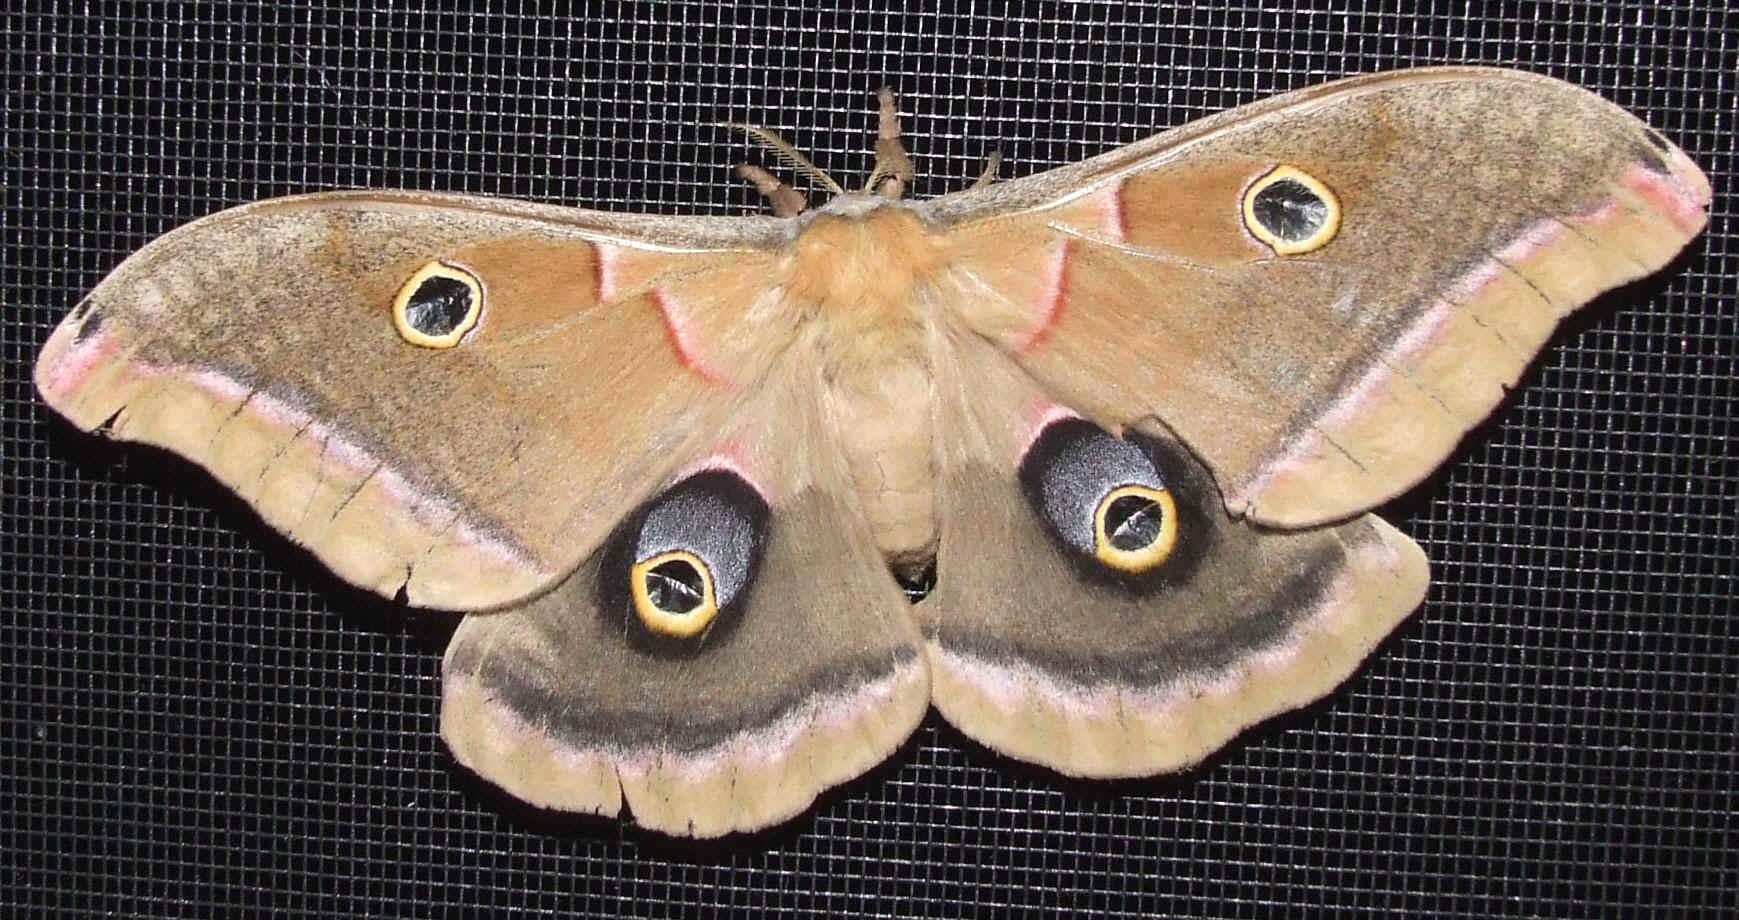 ' ' from the web at 'http://www.focusonnature.com/MothsO84.jpg'